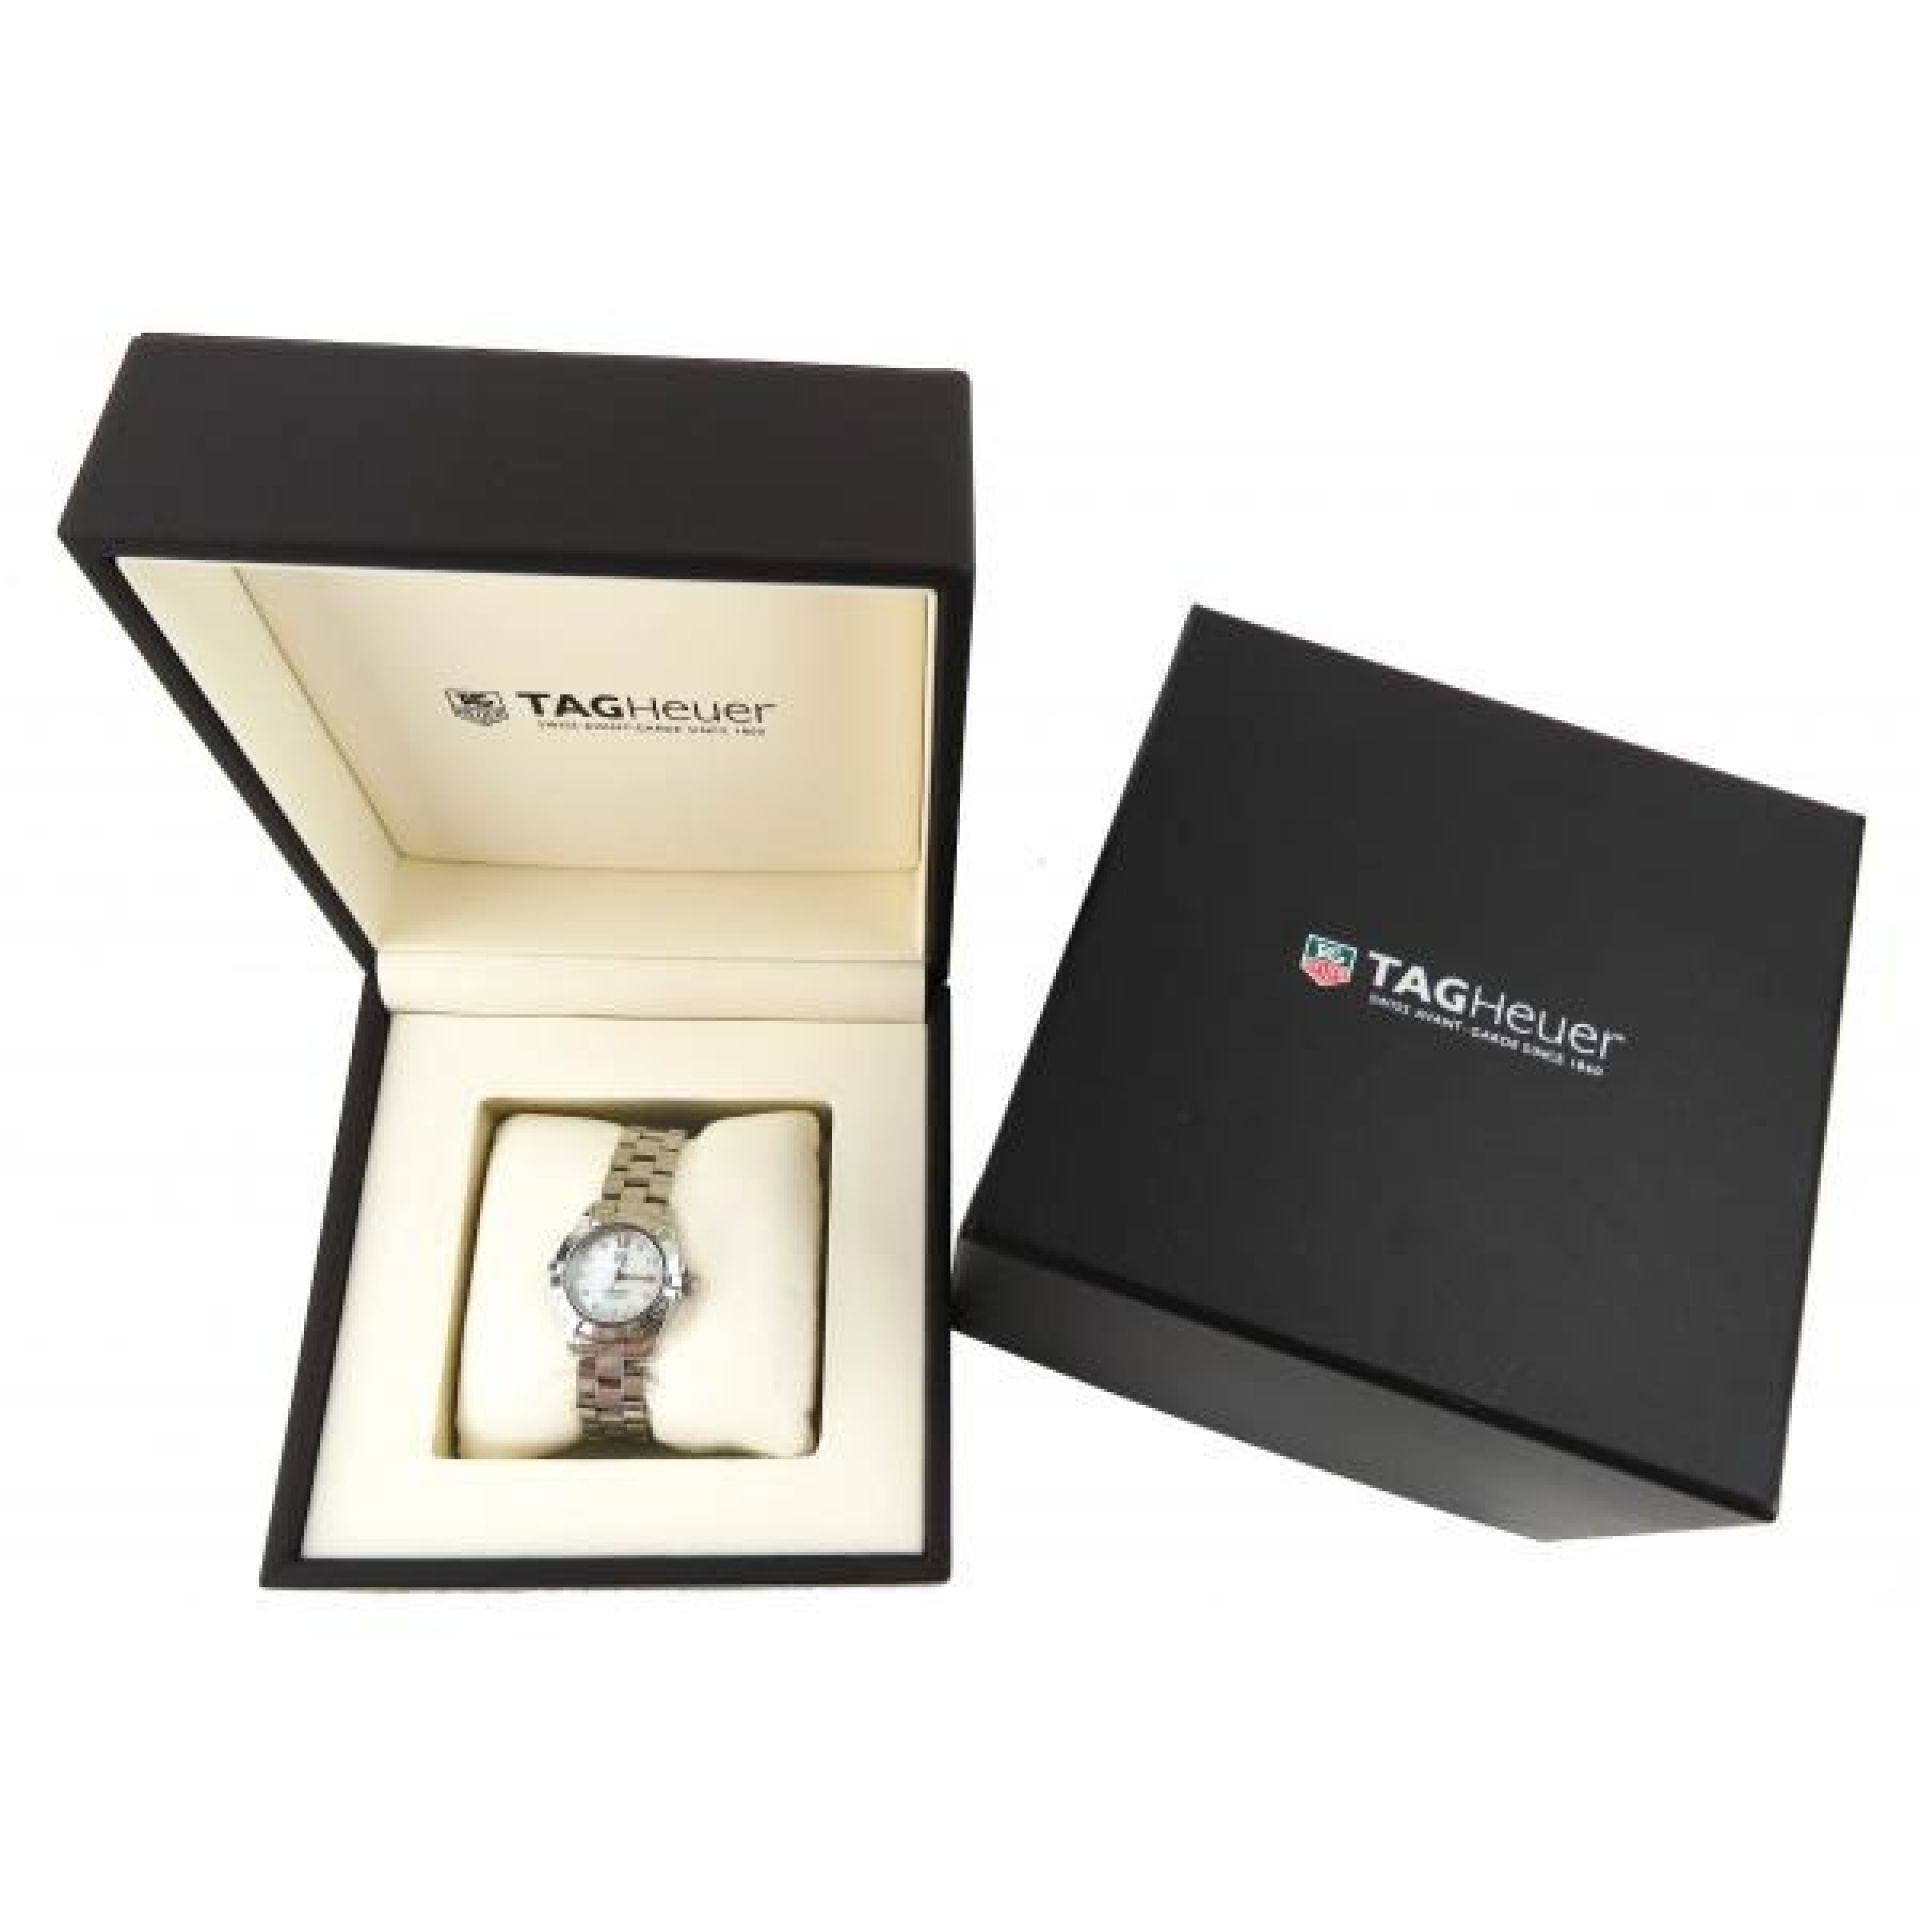 Tag Heuer Stainless Steel Diamond Aquaracer Quartz Watch